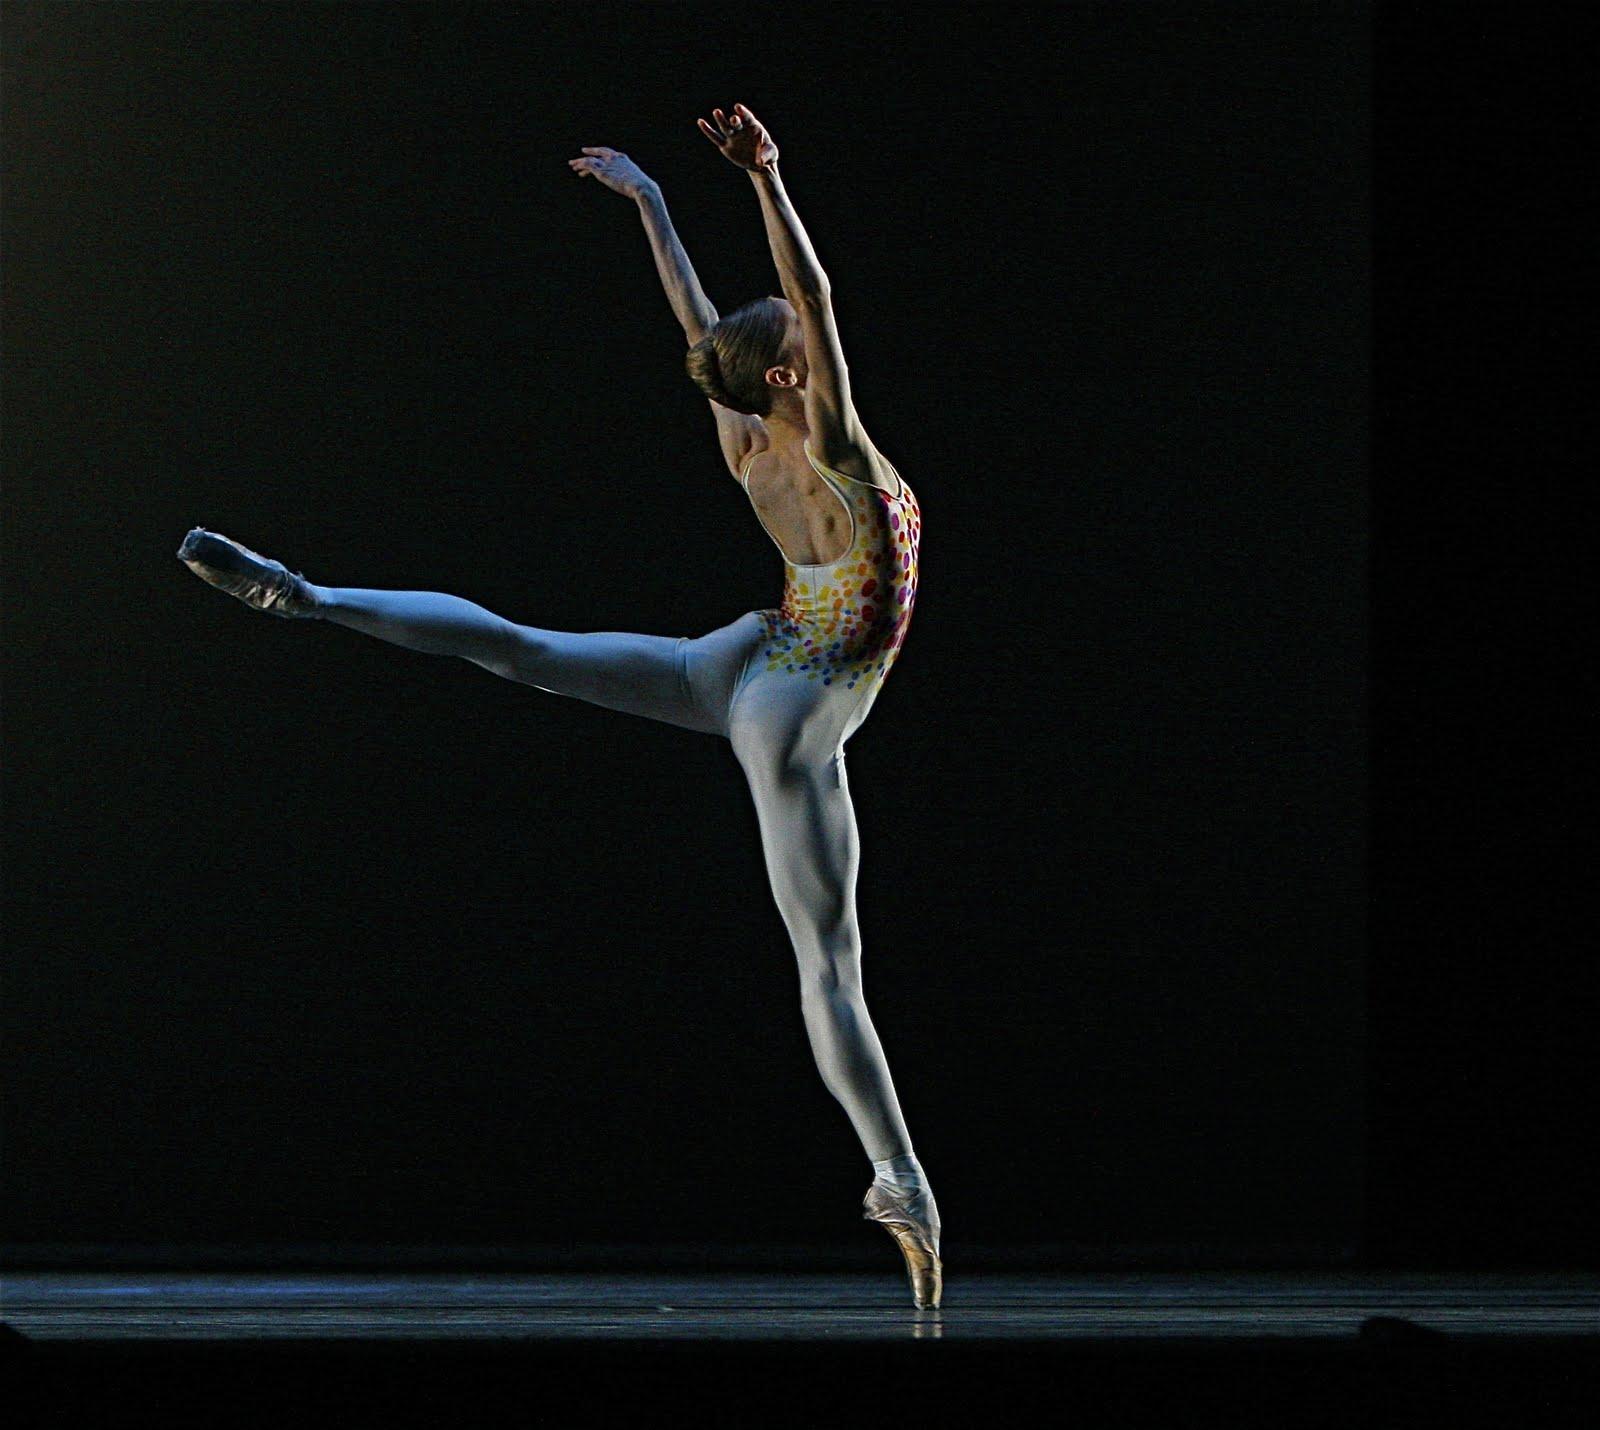 dancer in costume in jump